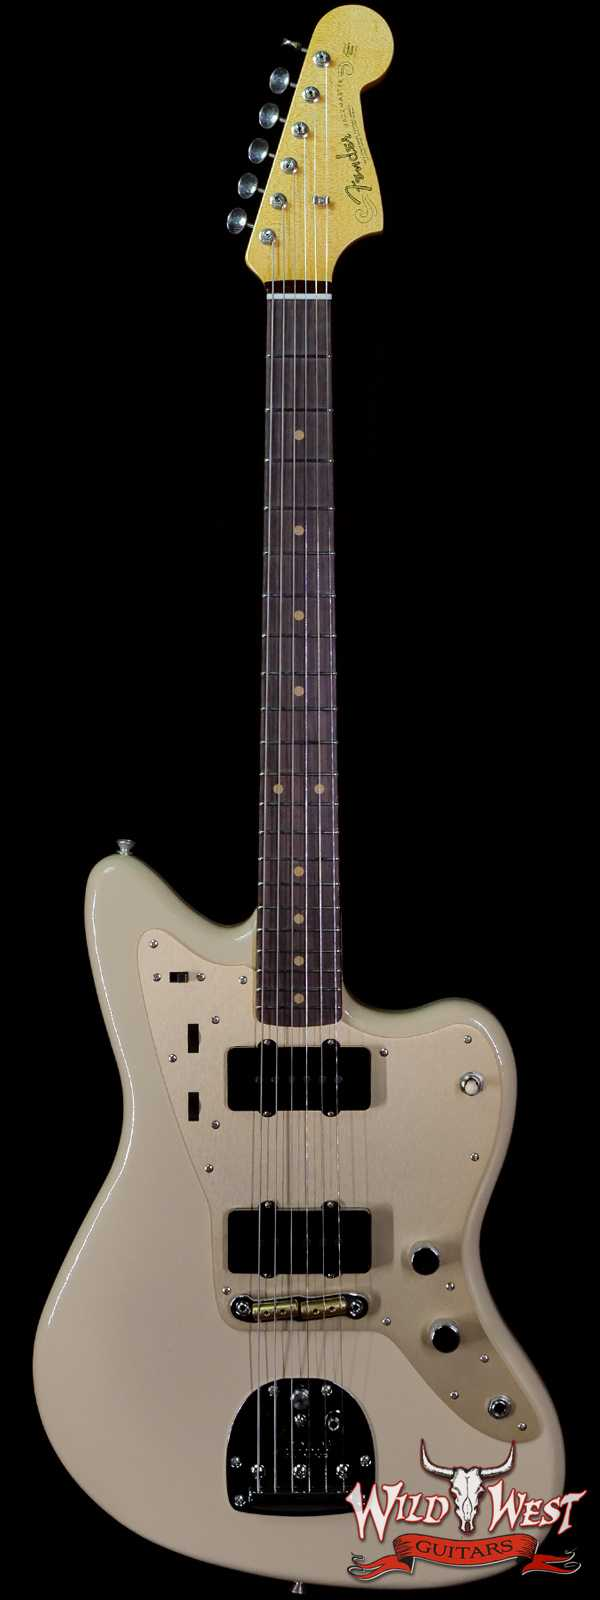 Fender Custom Shop 2021 Summer Event Limited Edition 250K 1959 Jazzmaster Hand-Wound Pickups DLX Closet Classic Dessert Sand